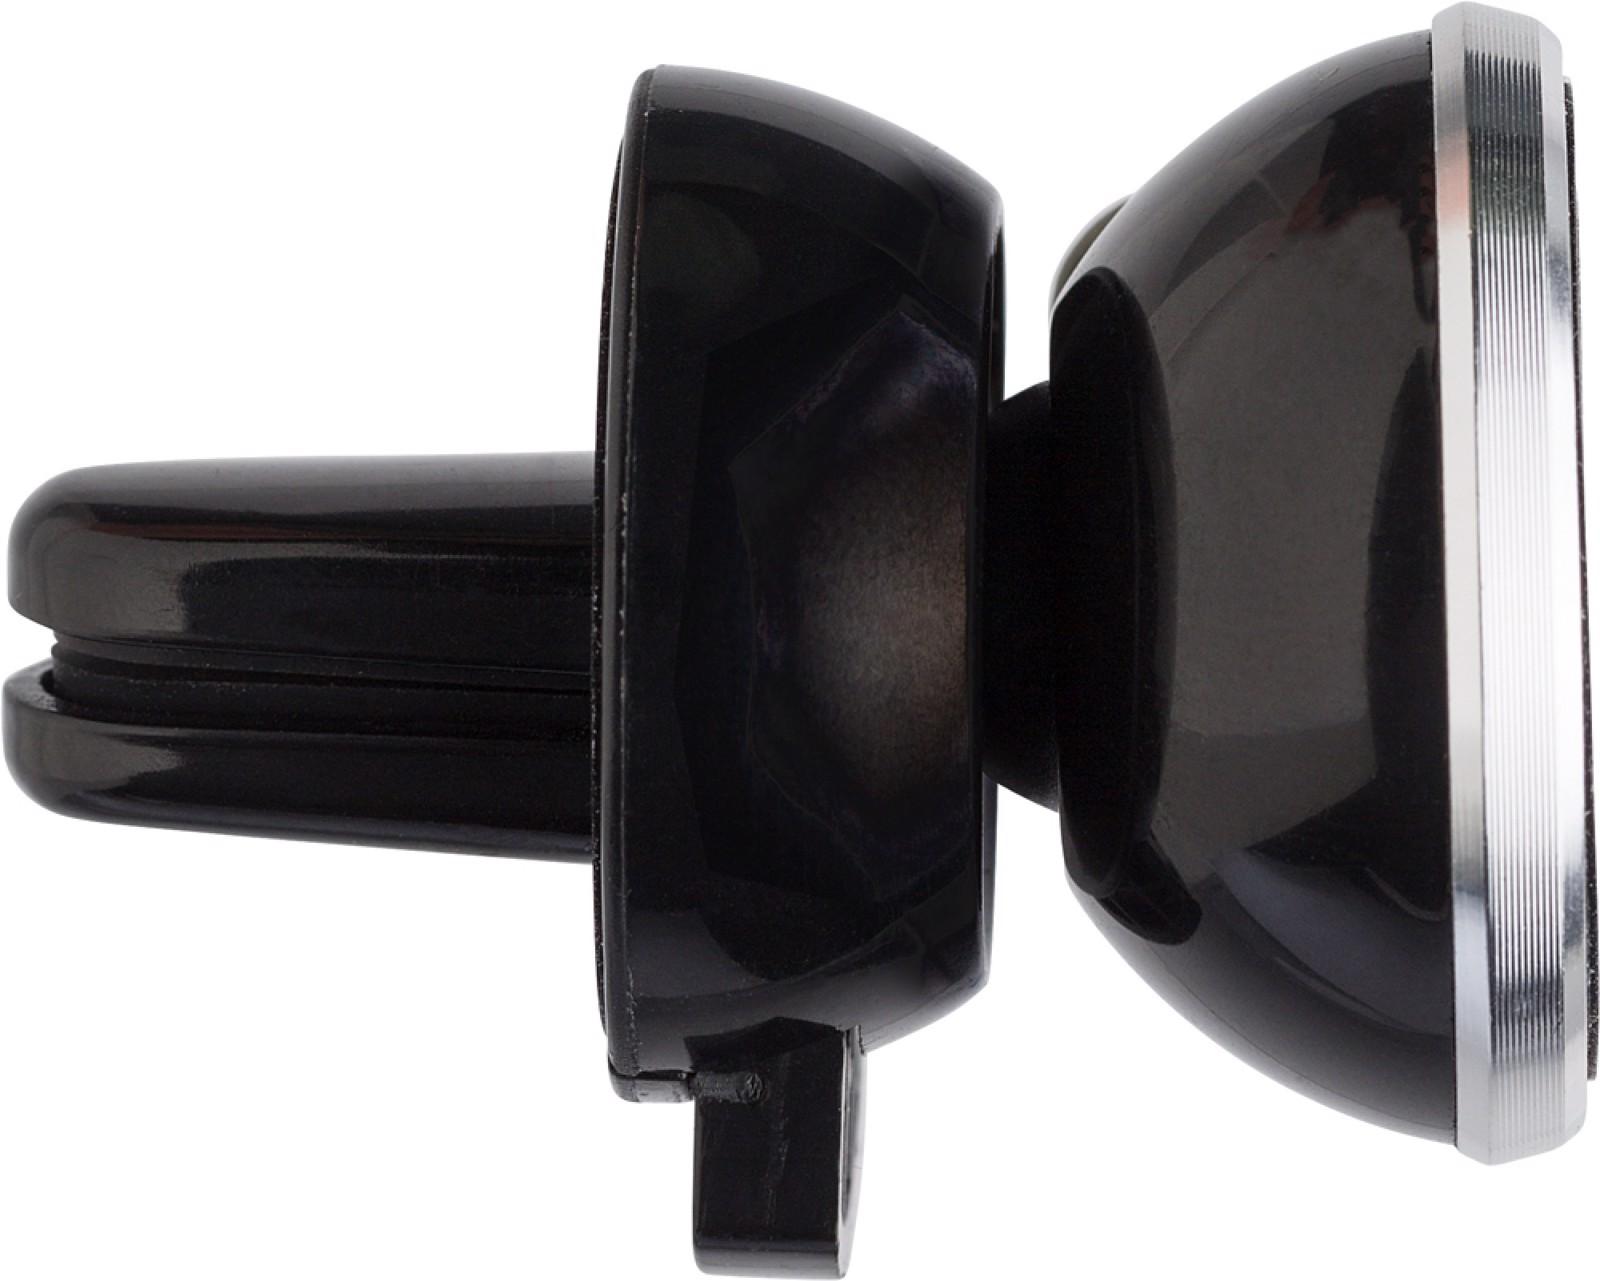 ABS smart phone holder